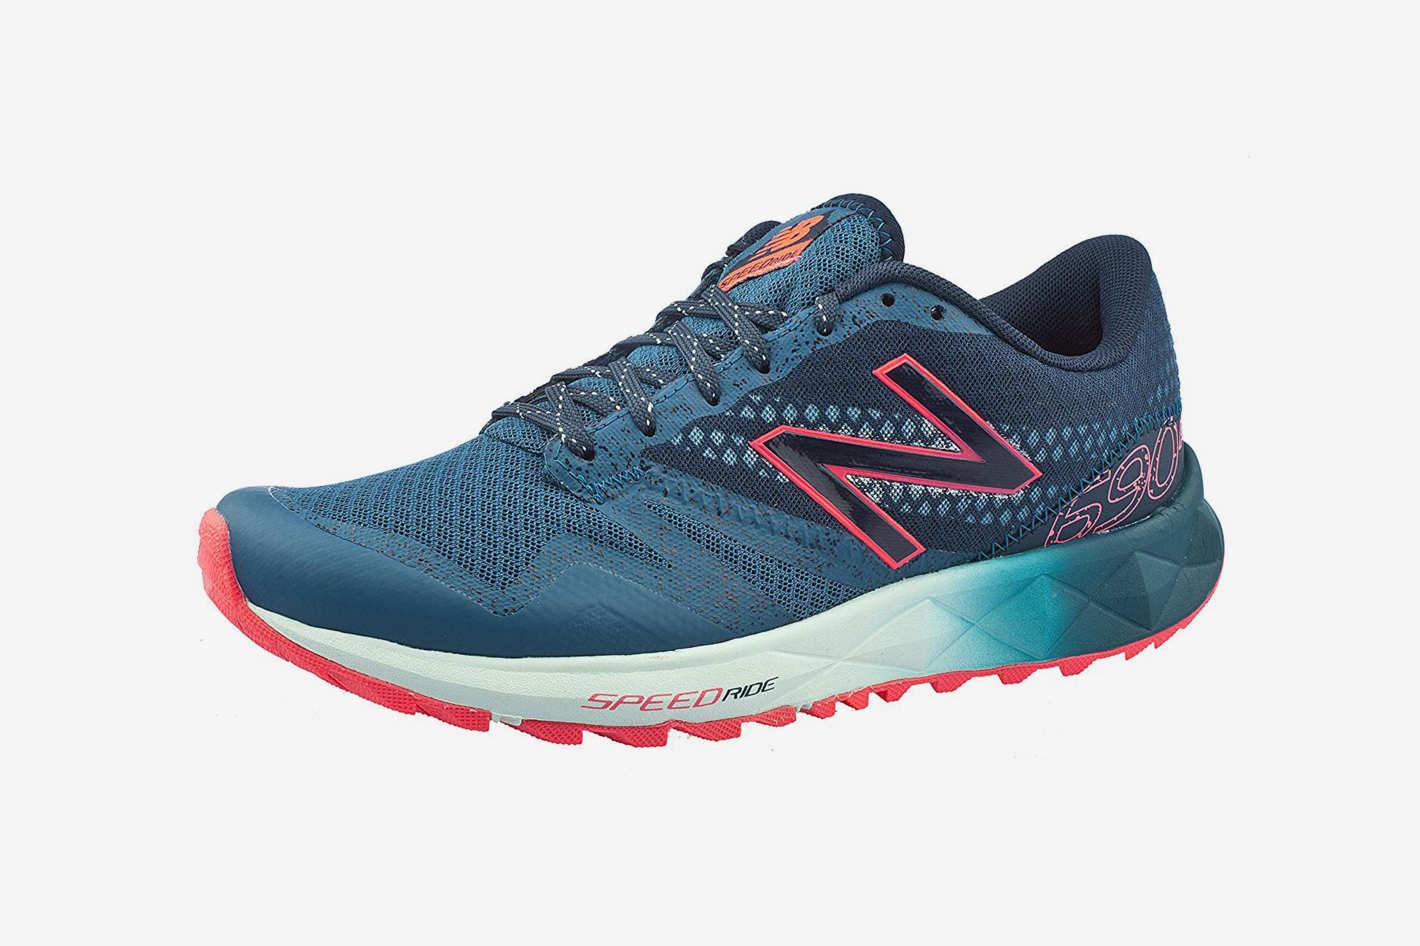 running sneakers new balance womenu0027s wt690 trail running sneaker YYQPKRO